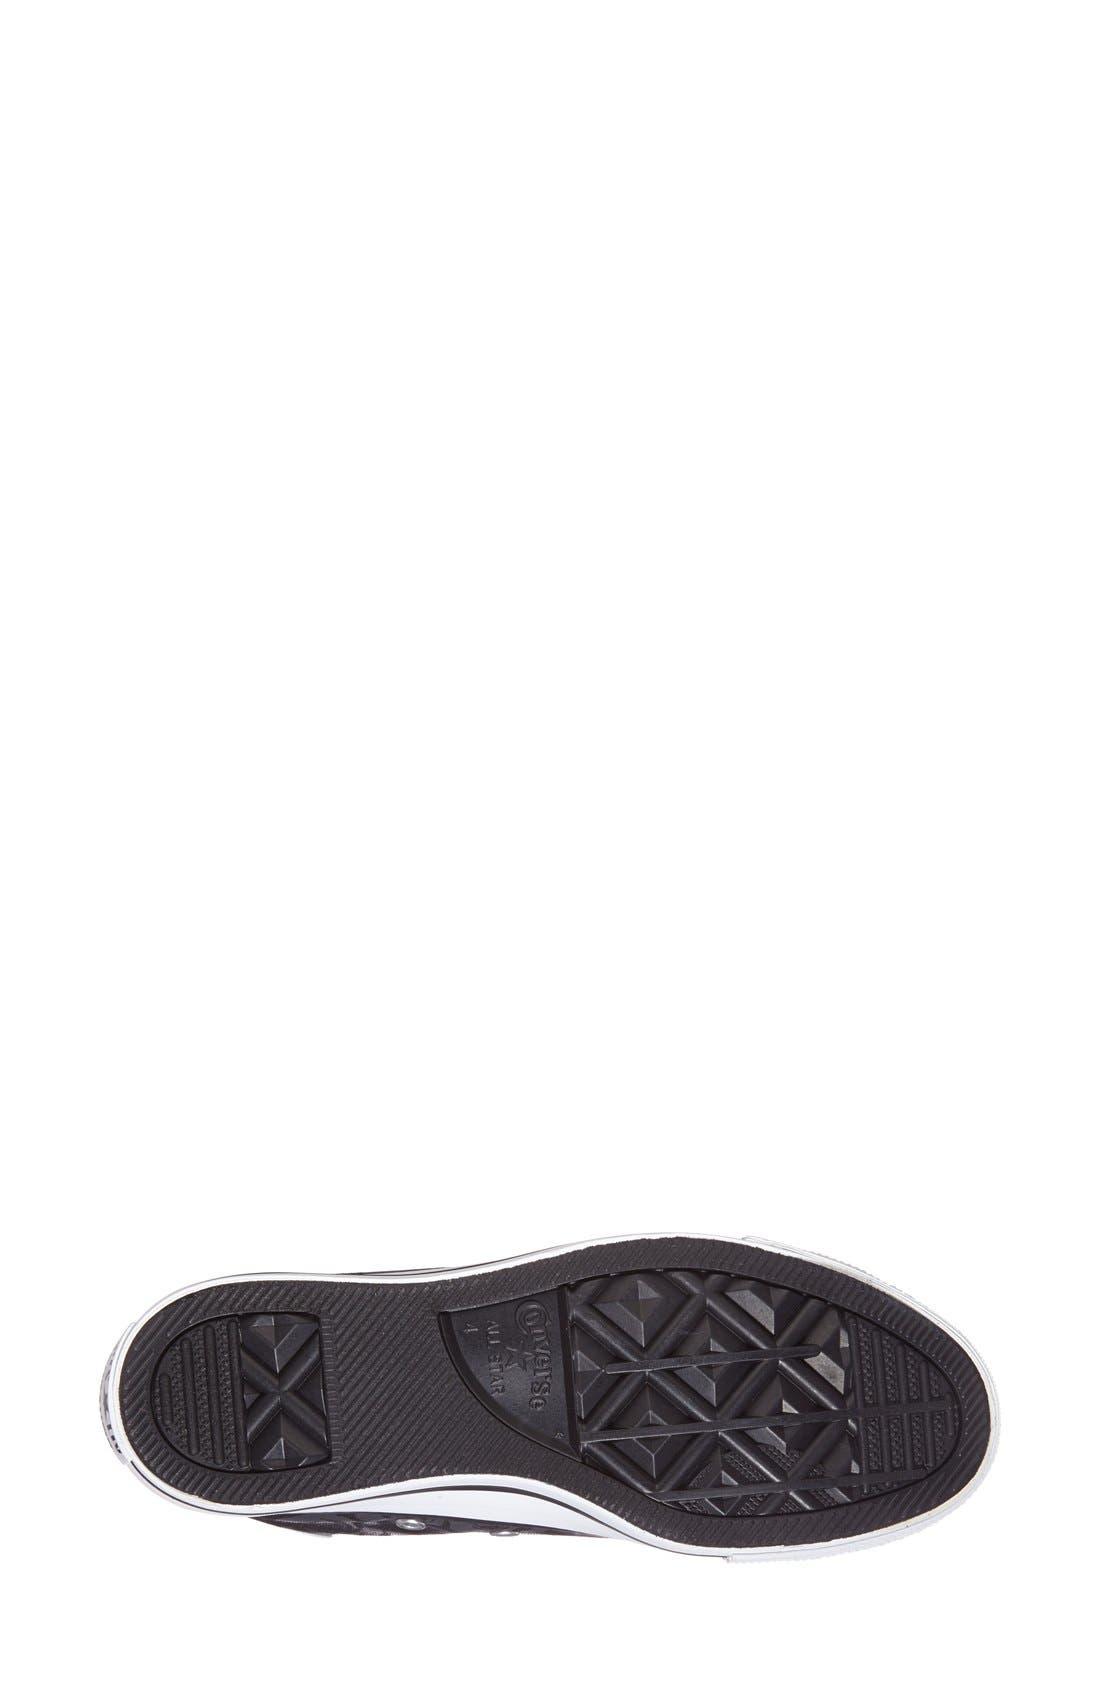 Alternate Image 4  - Converse Chuck Taylor® All Star® Rose Print High Top Sneaker (Women)